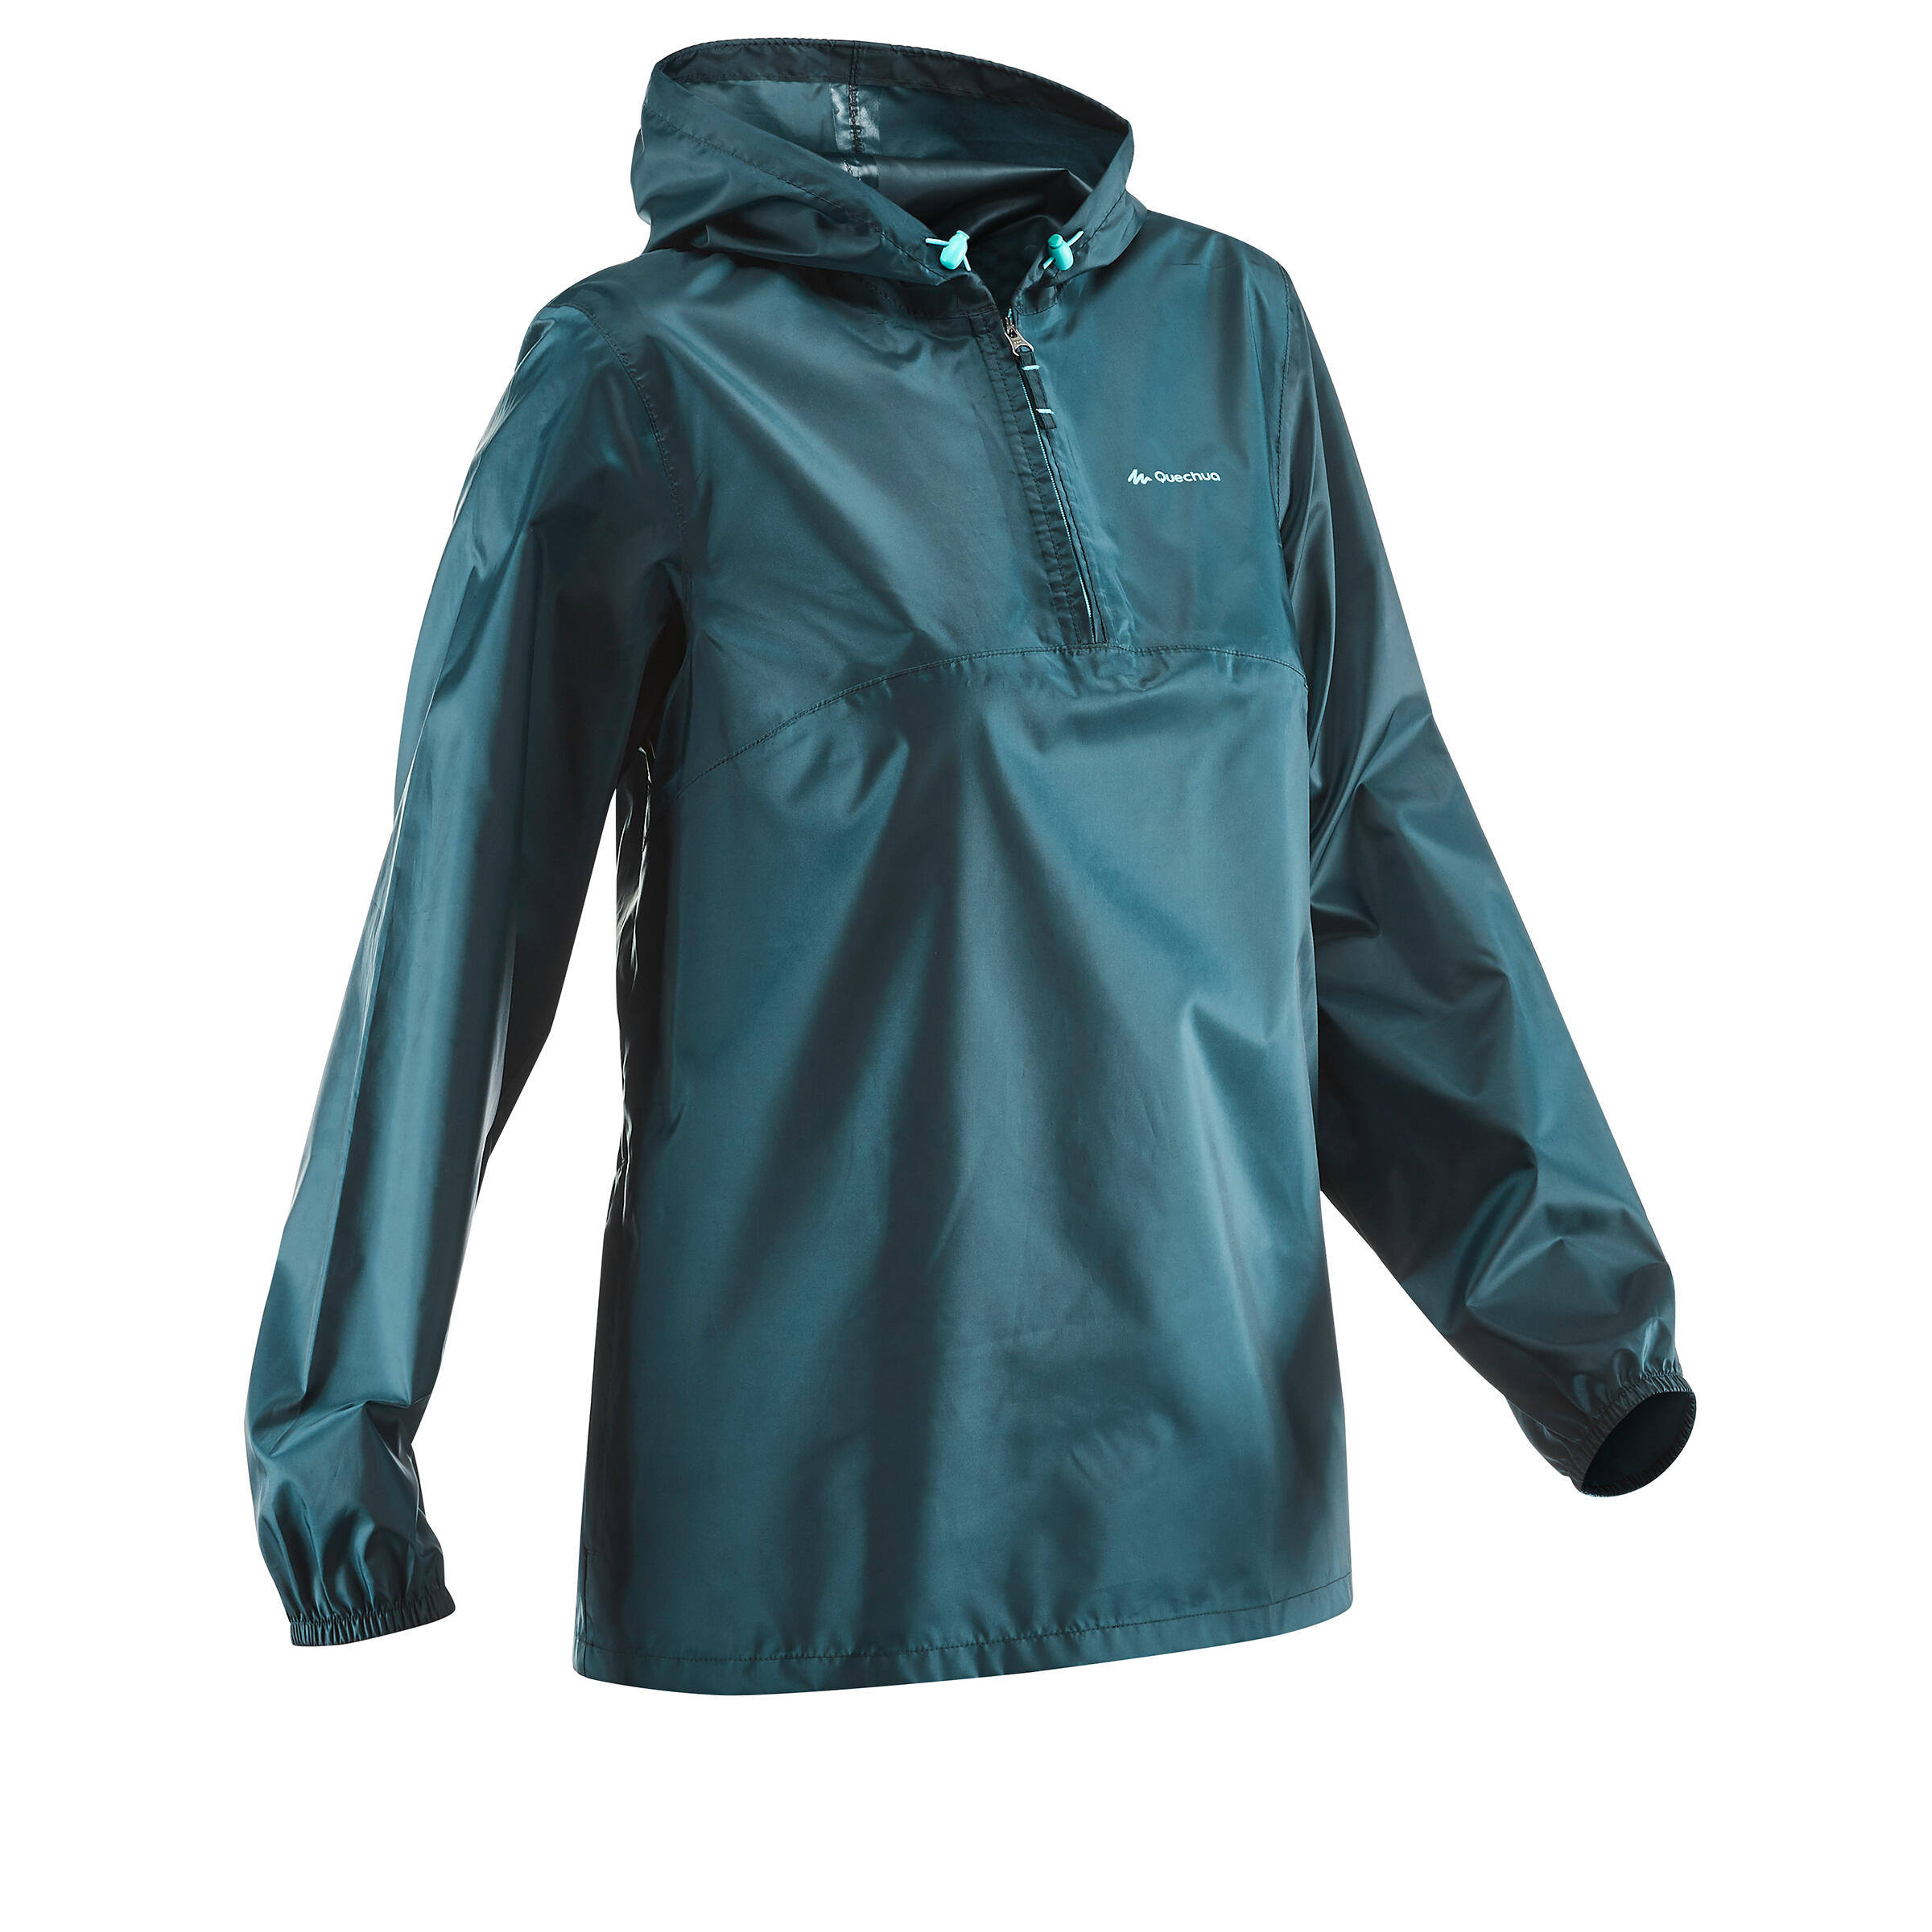 NH100 Raincut Zip Women's Waterproof Country Walking Rain Jacket Turquoise